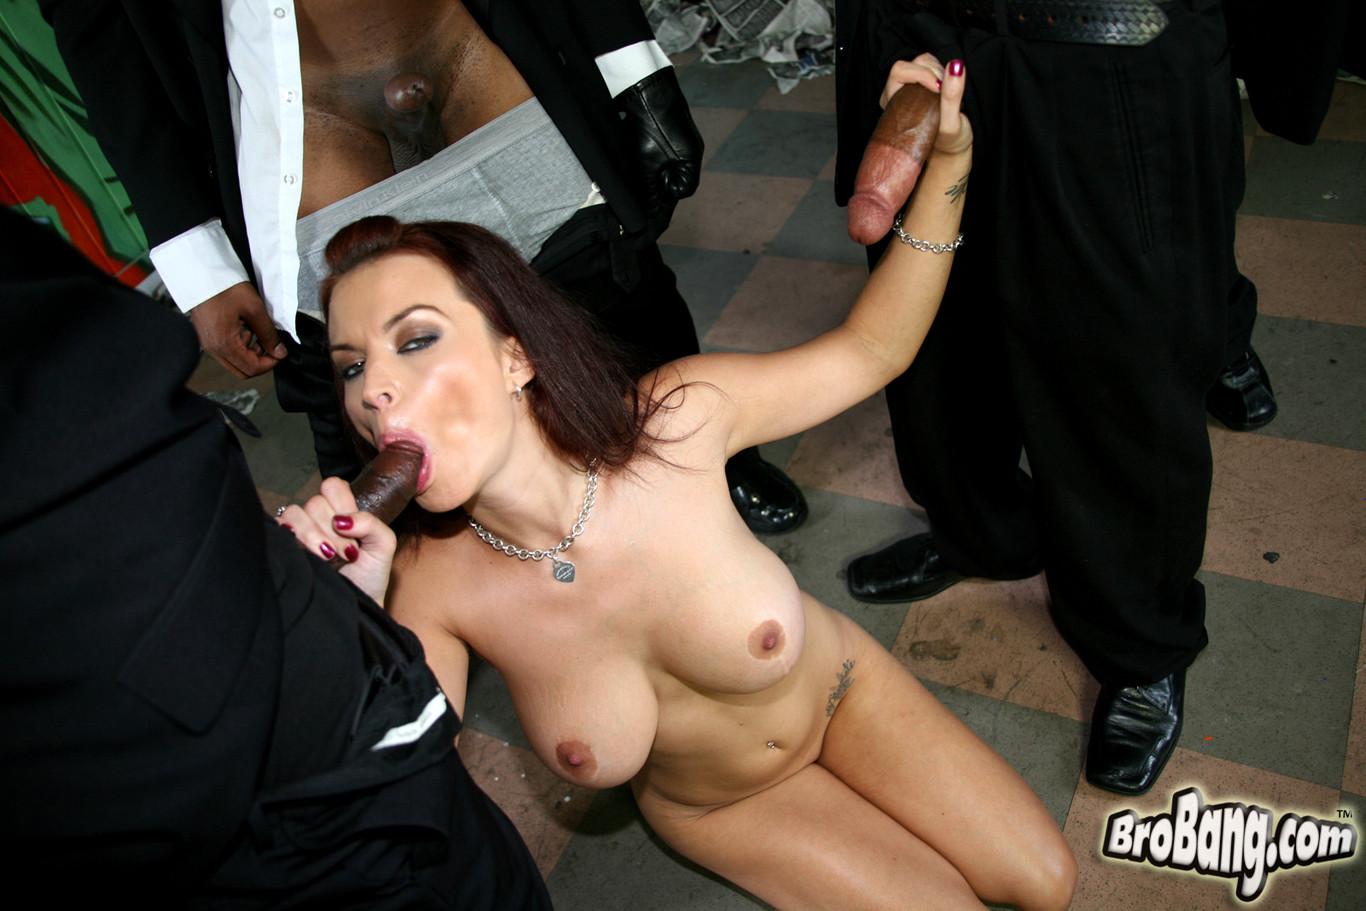 bailey-brooks-bukkake-lesbian-supar-best-gils-sex-pic